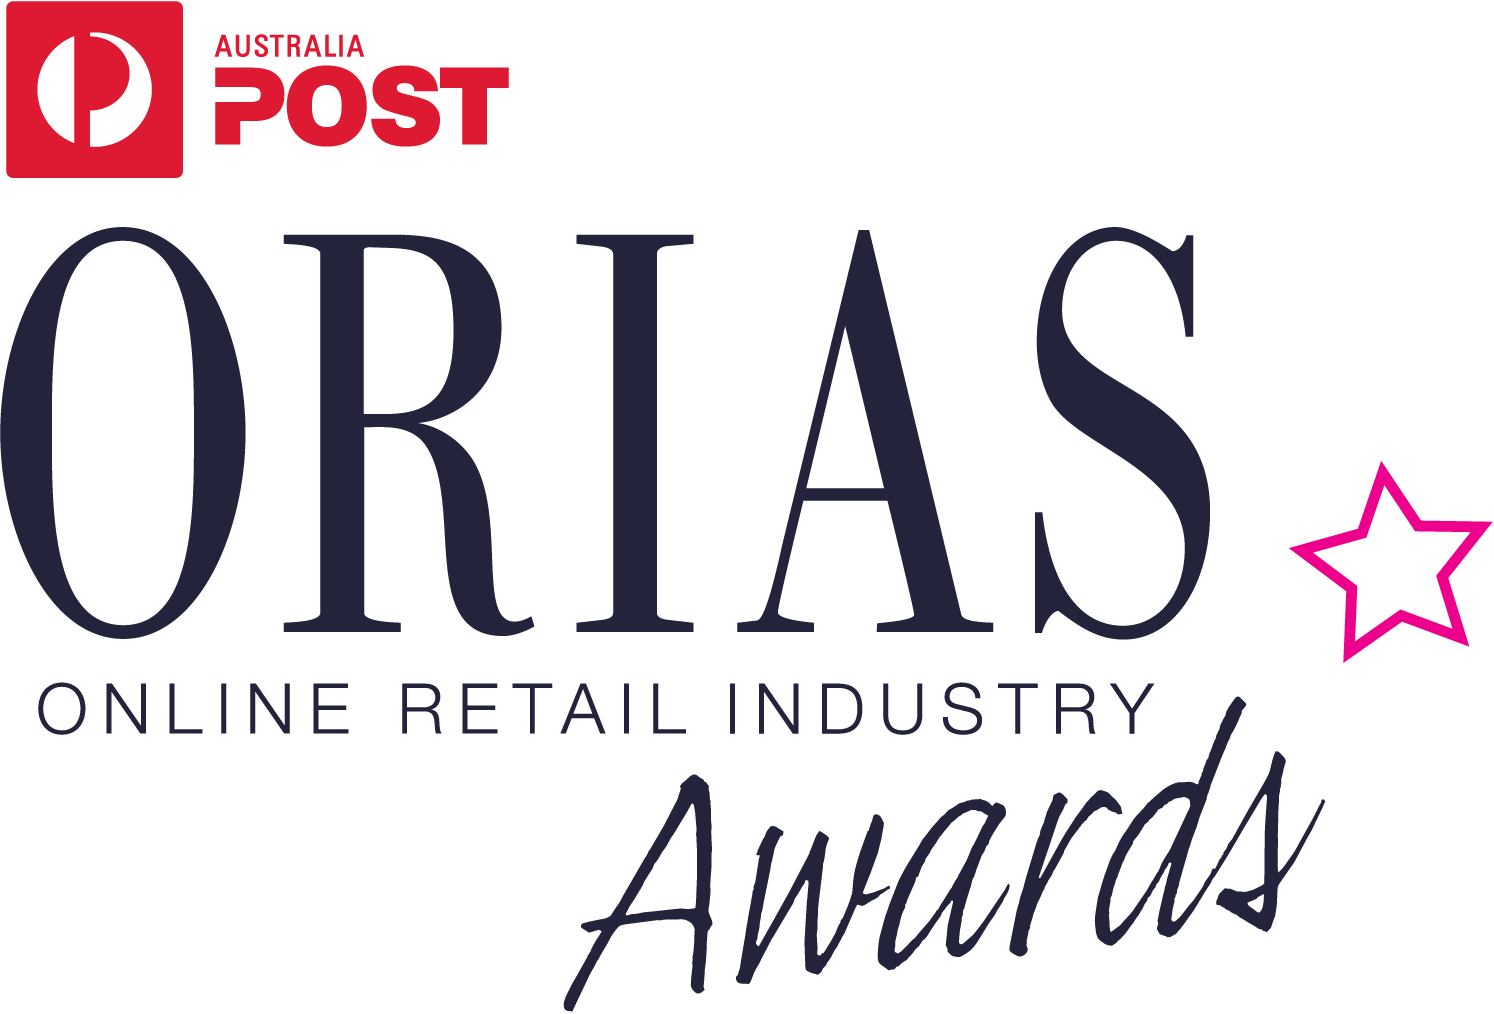 AUSTRALIA POST ORIAS FINALISTS ANNOUNCED